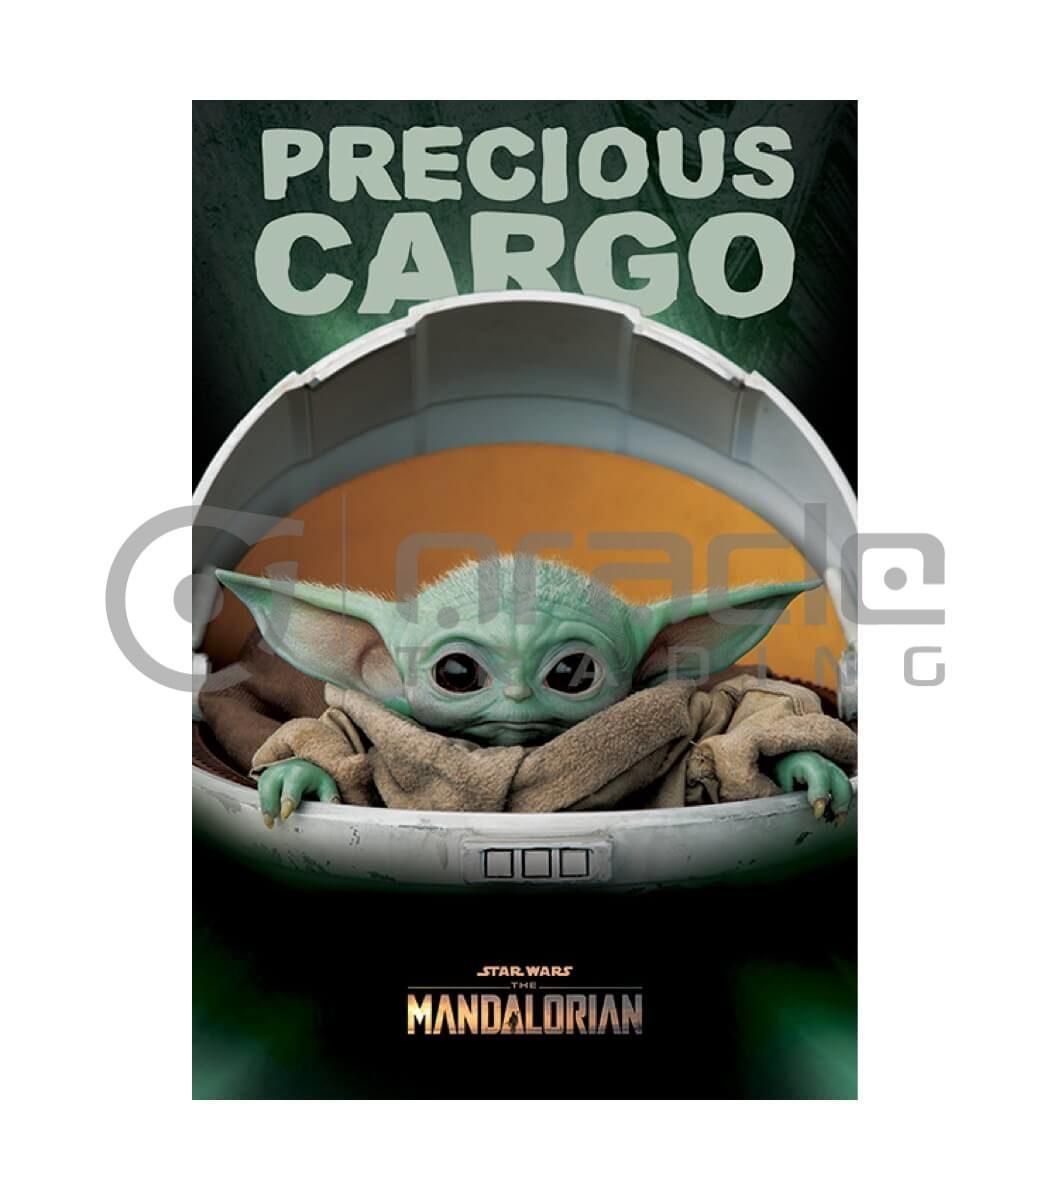 Star Wars: The Mandalorian Poster - Precious Cargo